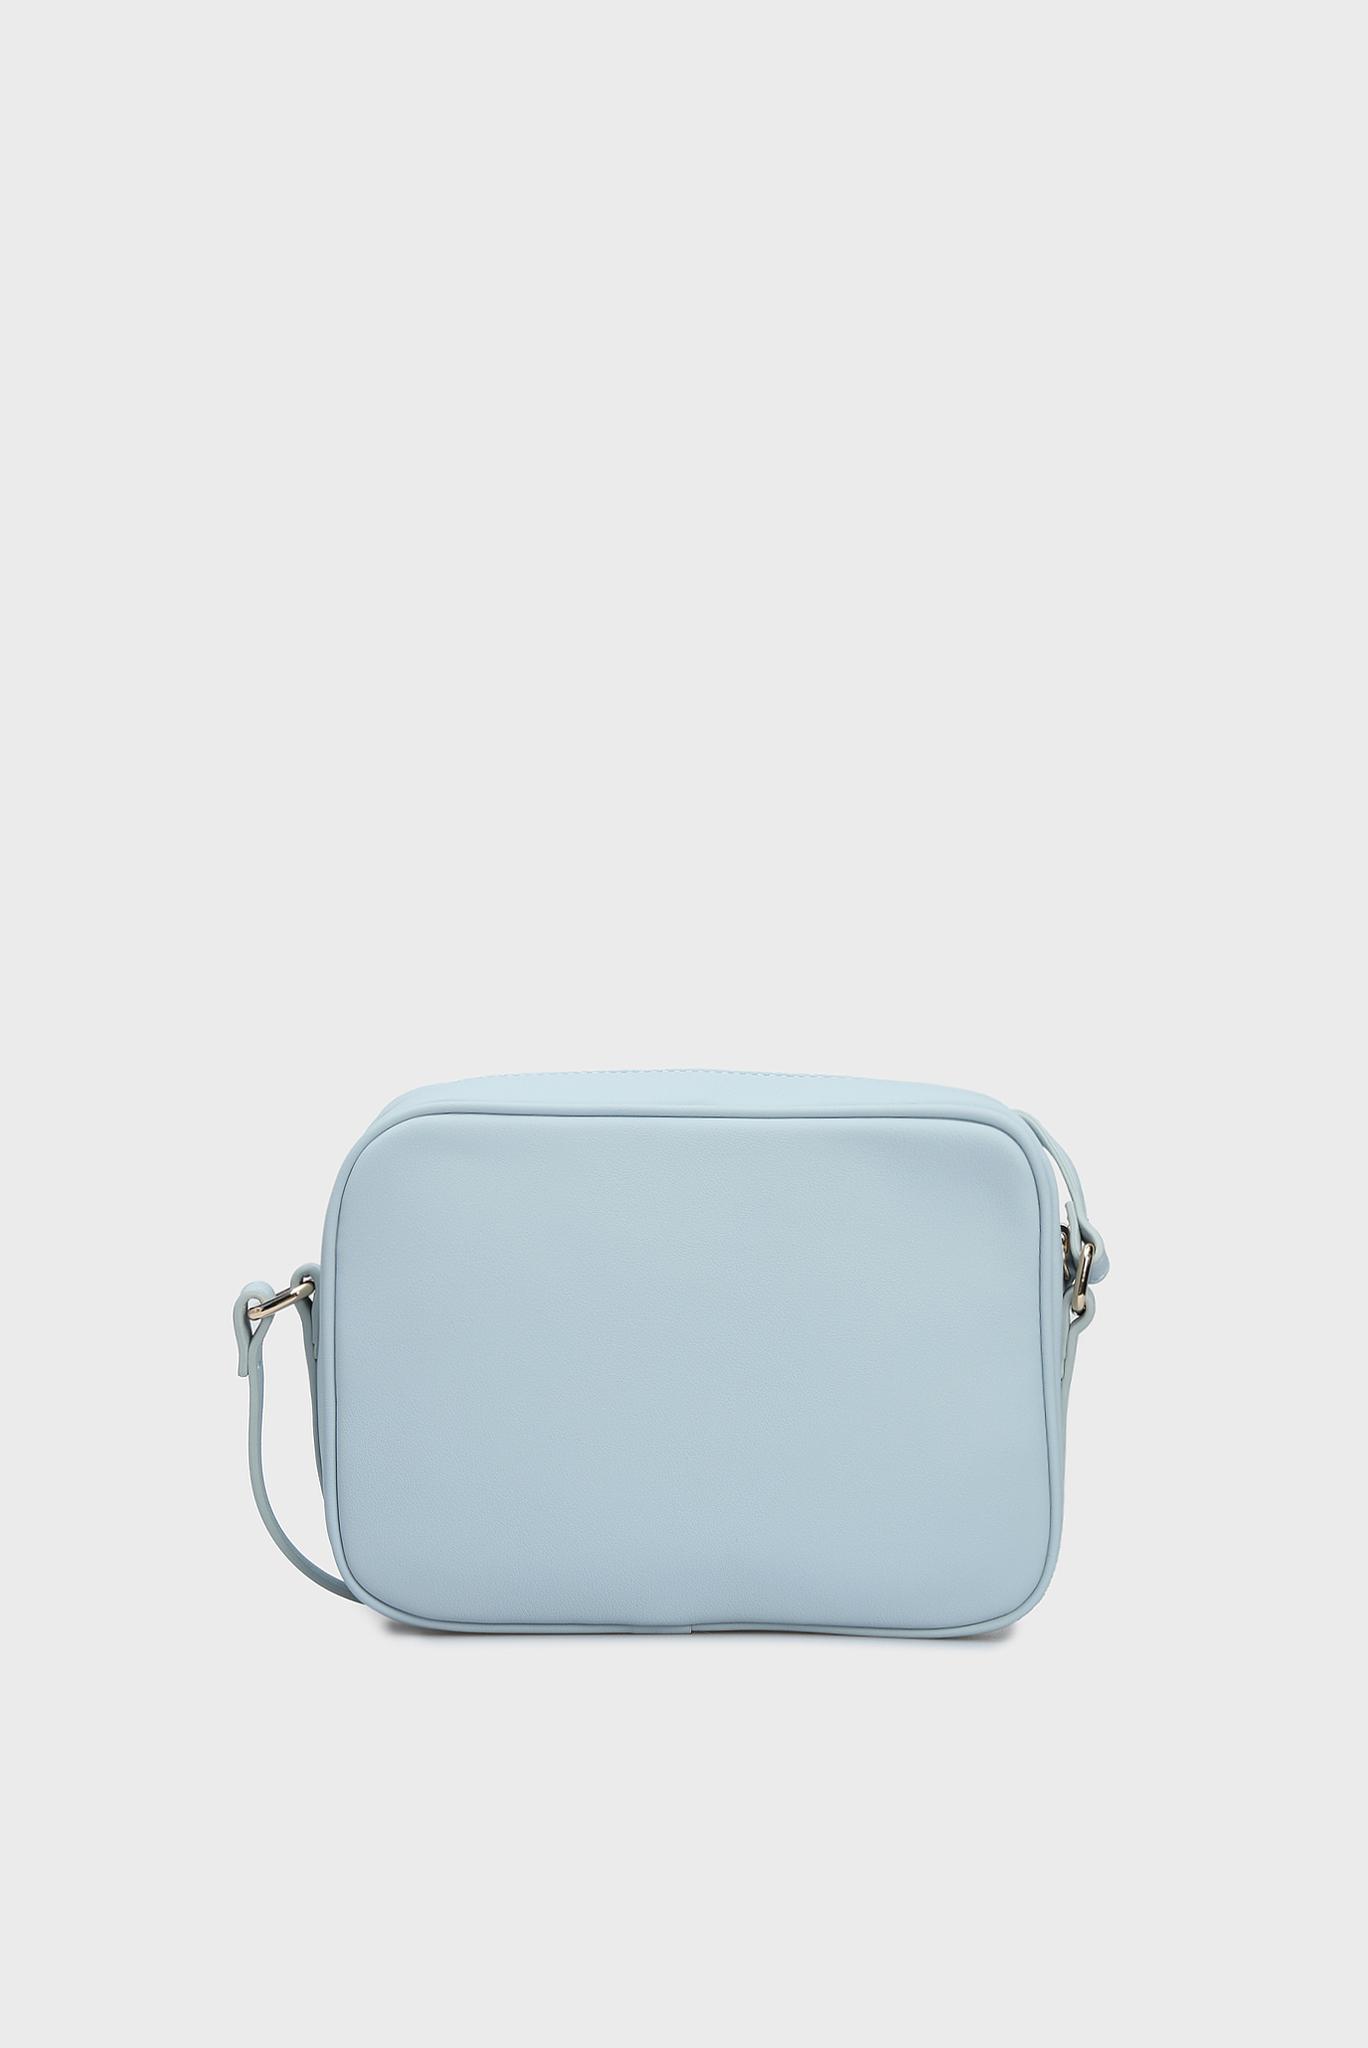 Женская голубая сумка через плечо TH CHIC Tommy Hilfiger